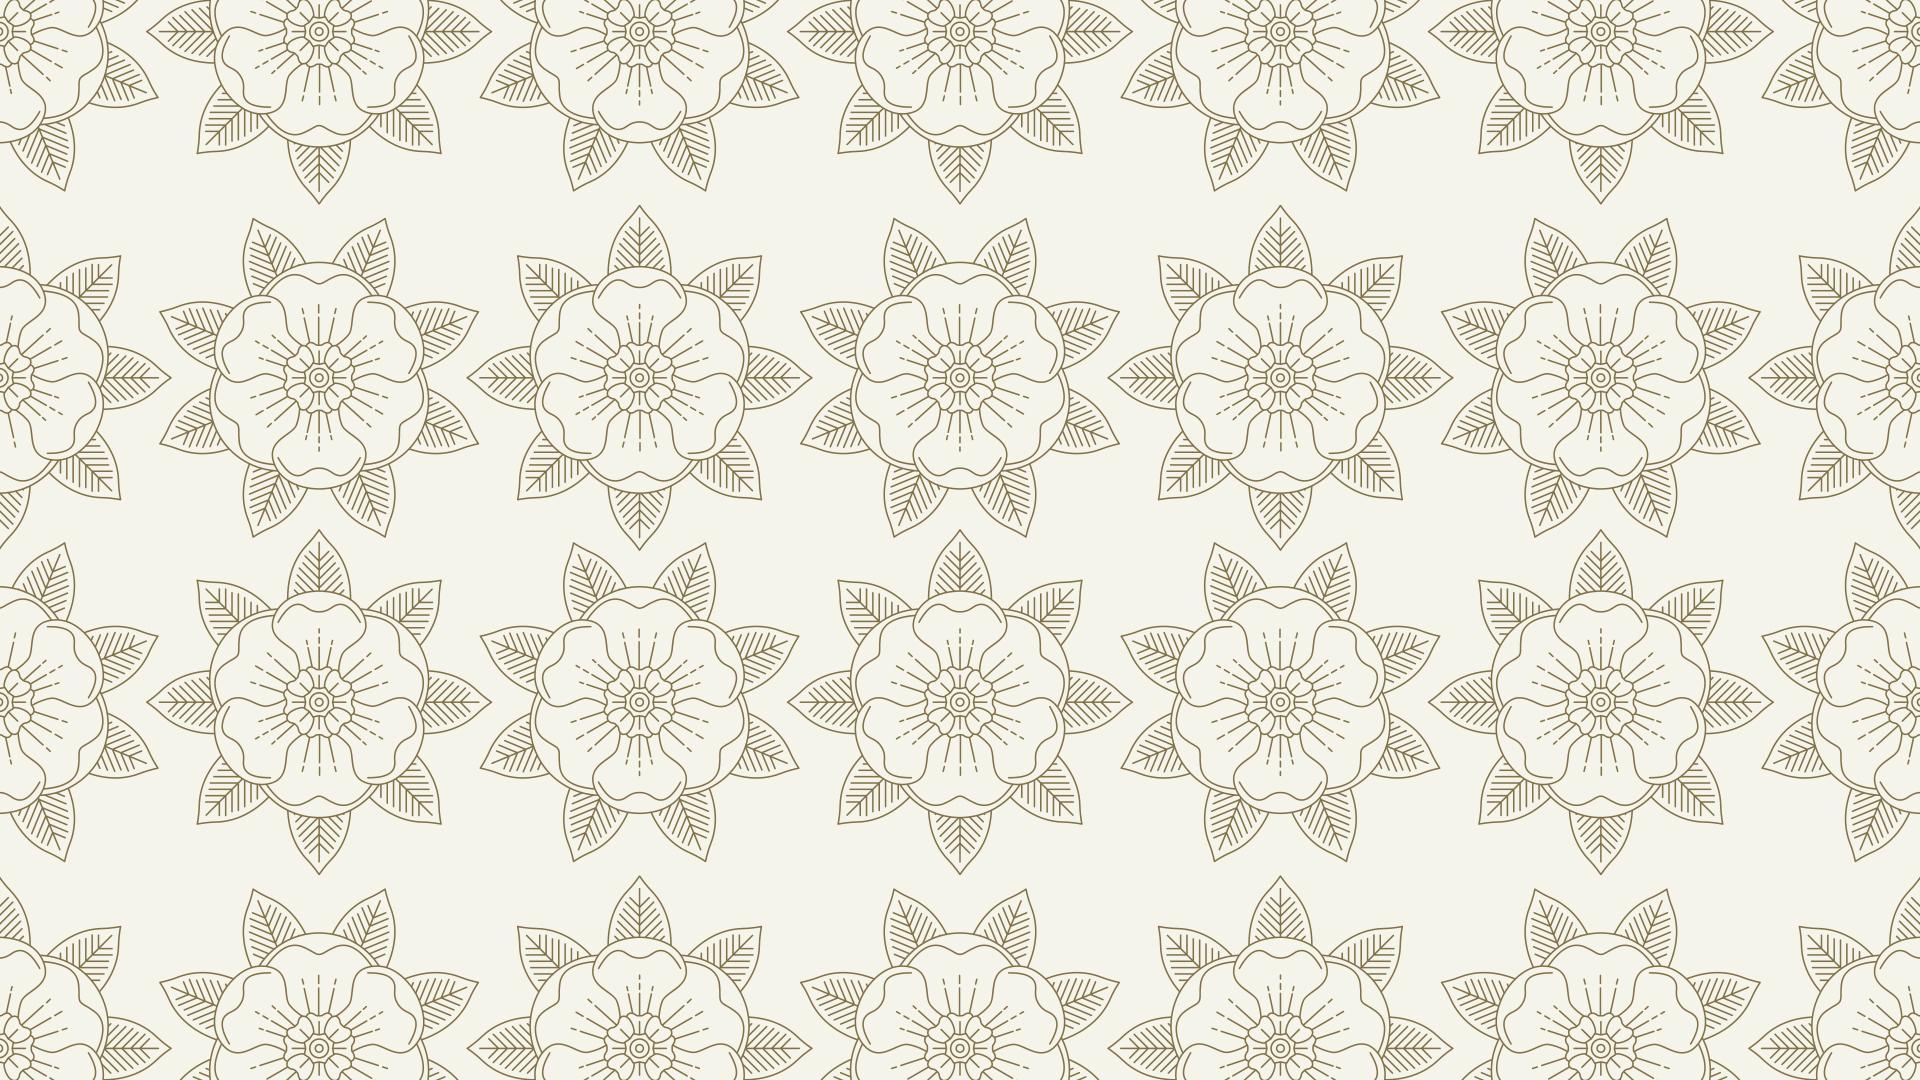 C2C magnolia pattern background